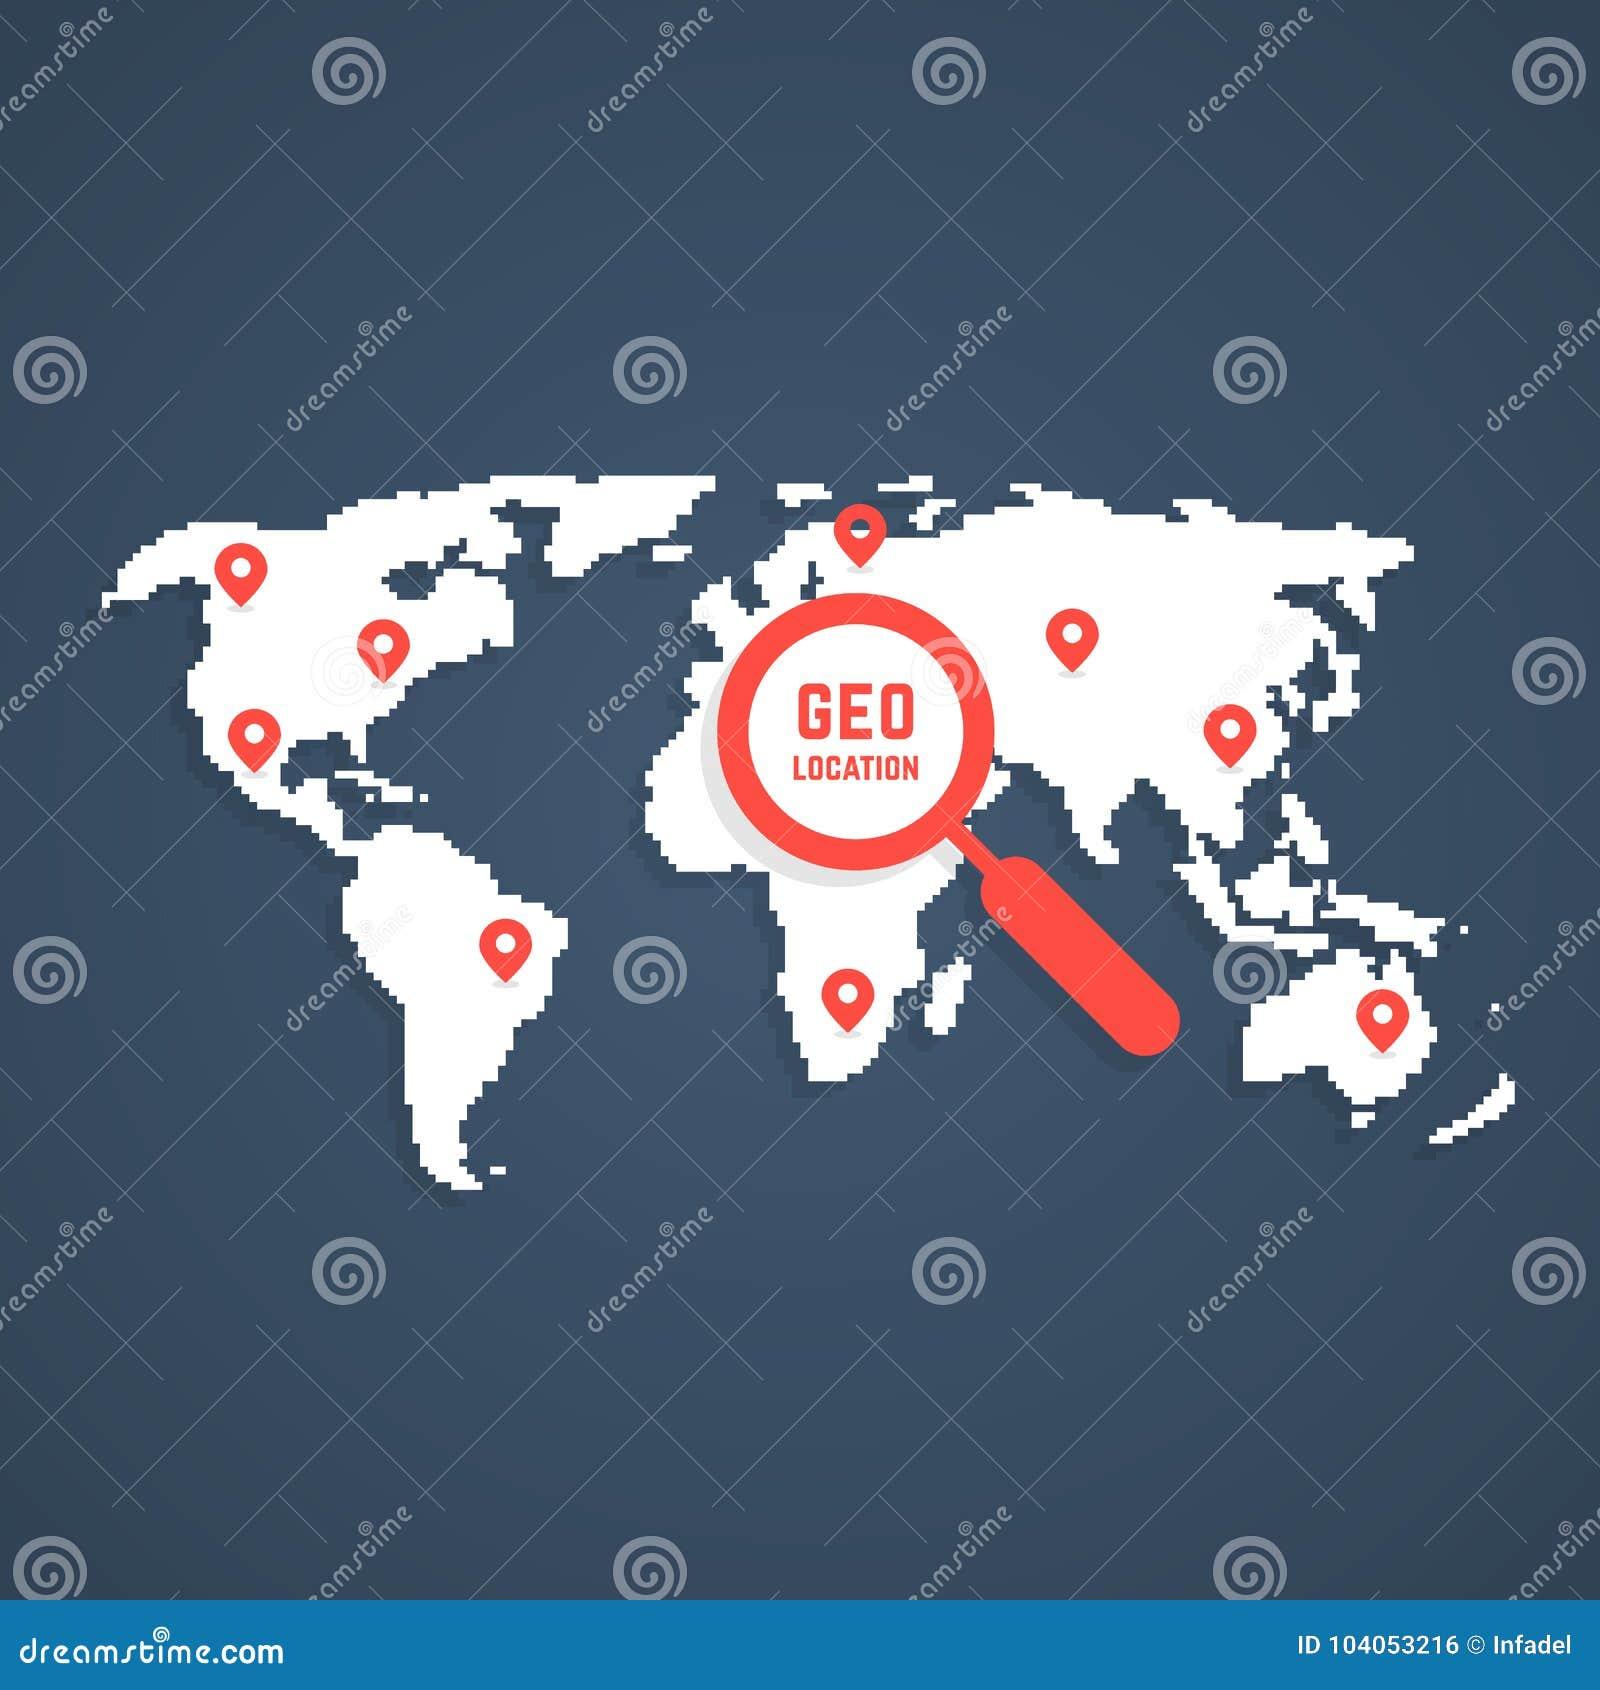 Geo Location With Pixel Art World Map Stock Vector Illustration Of Navigation Geolocator 104053216